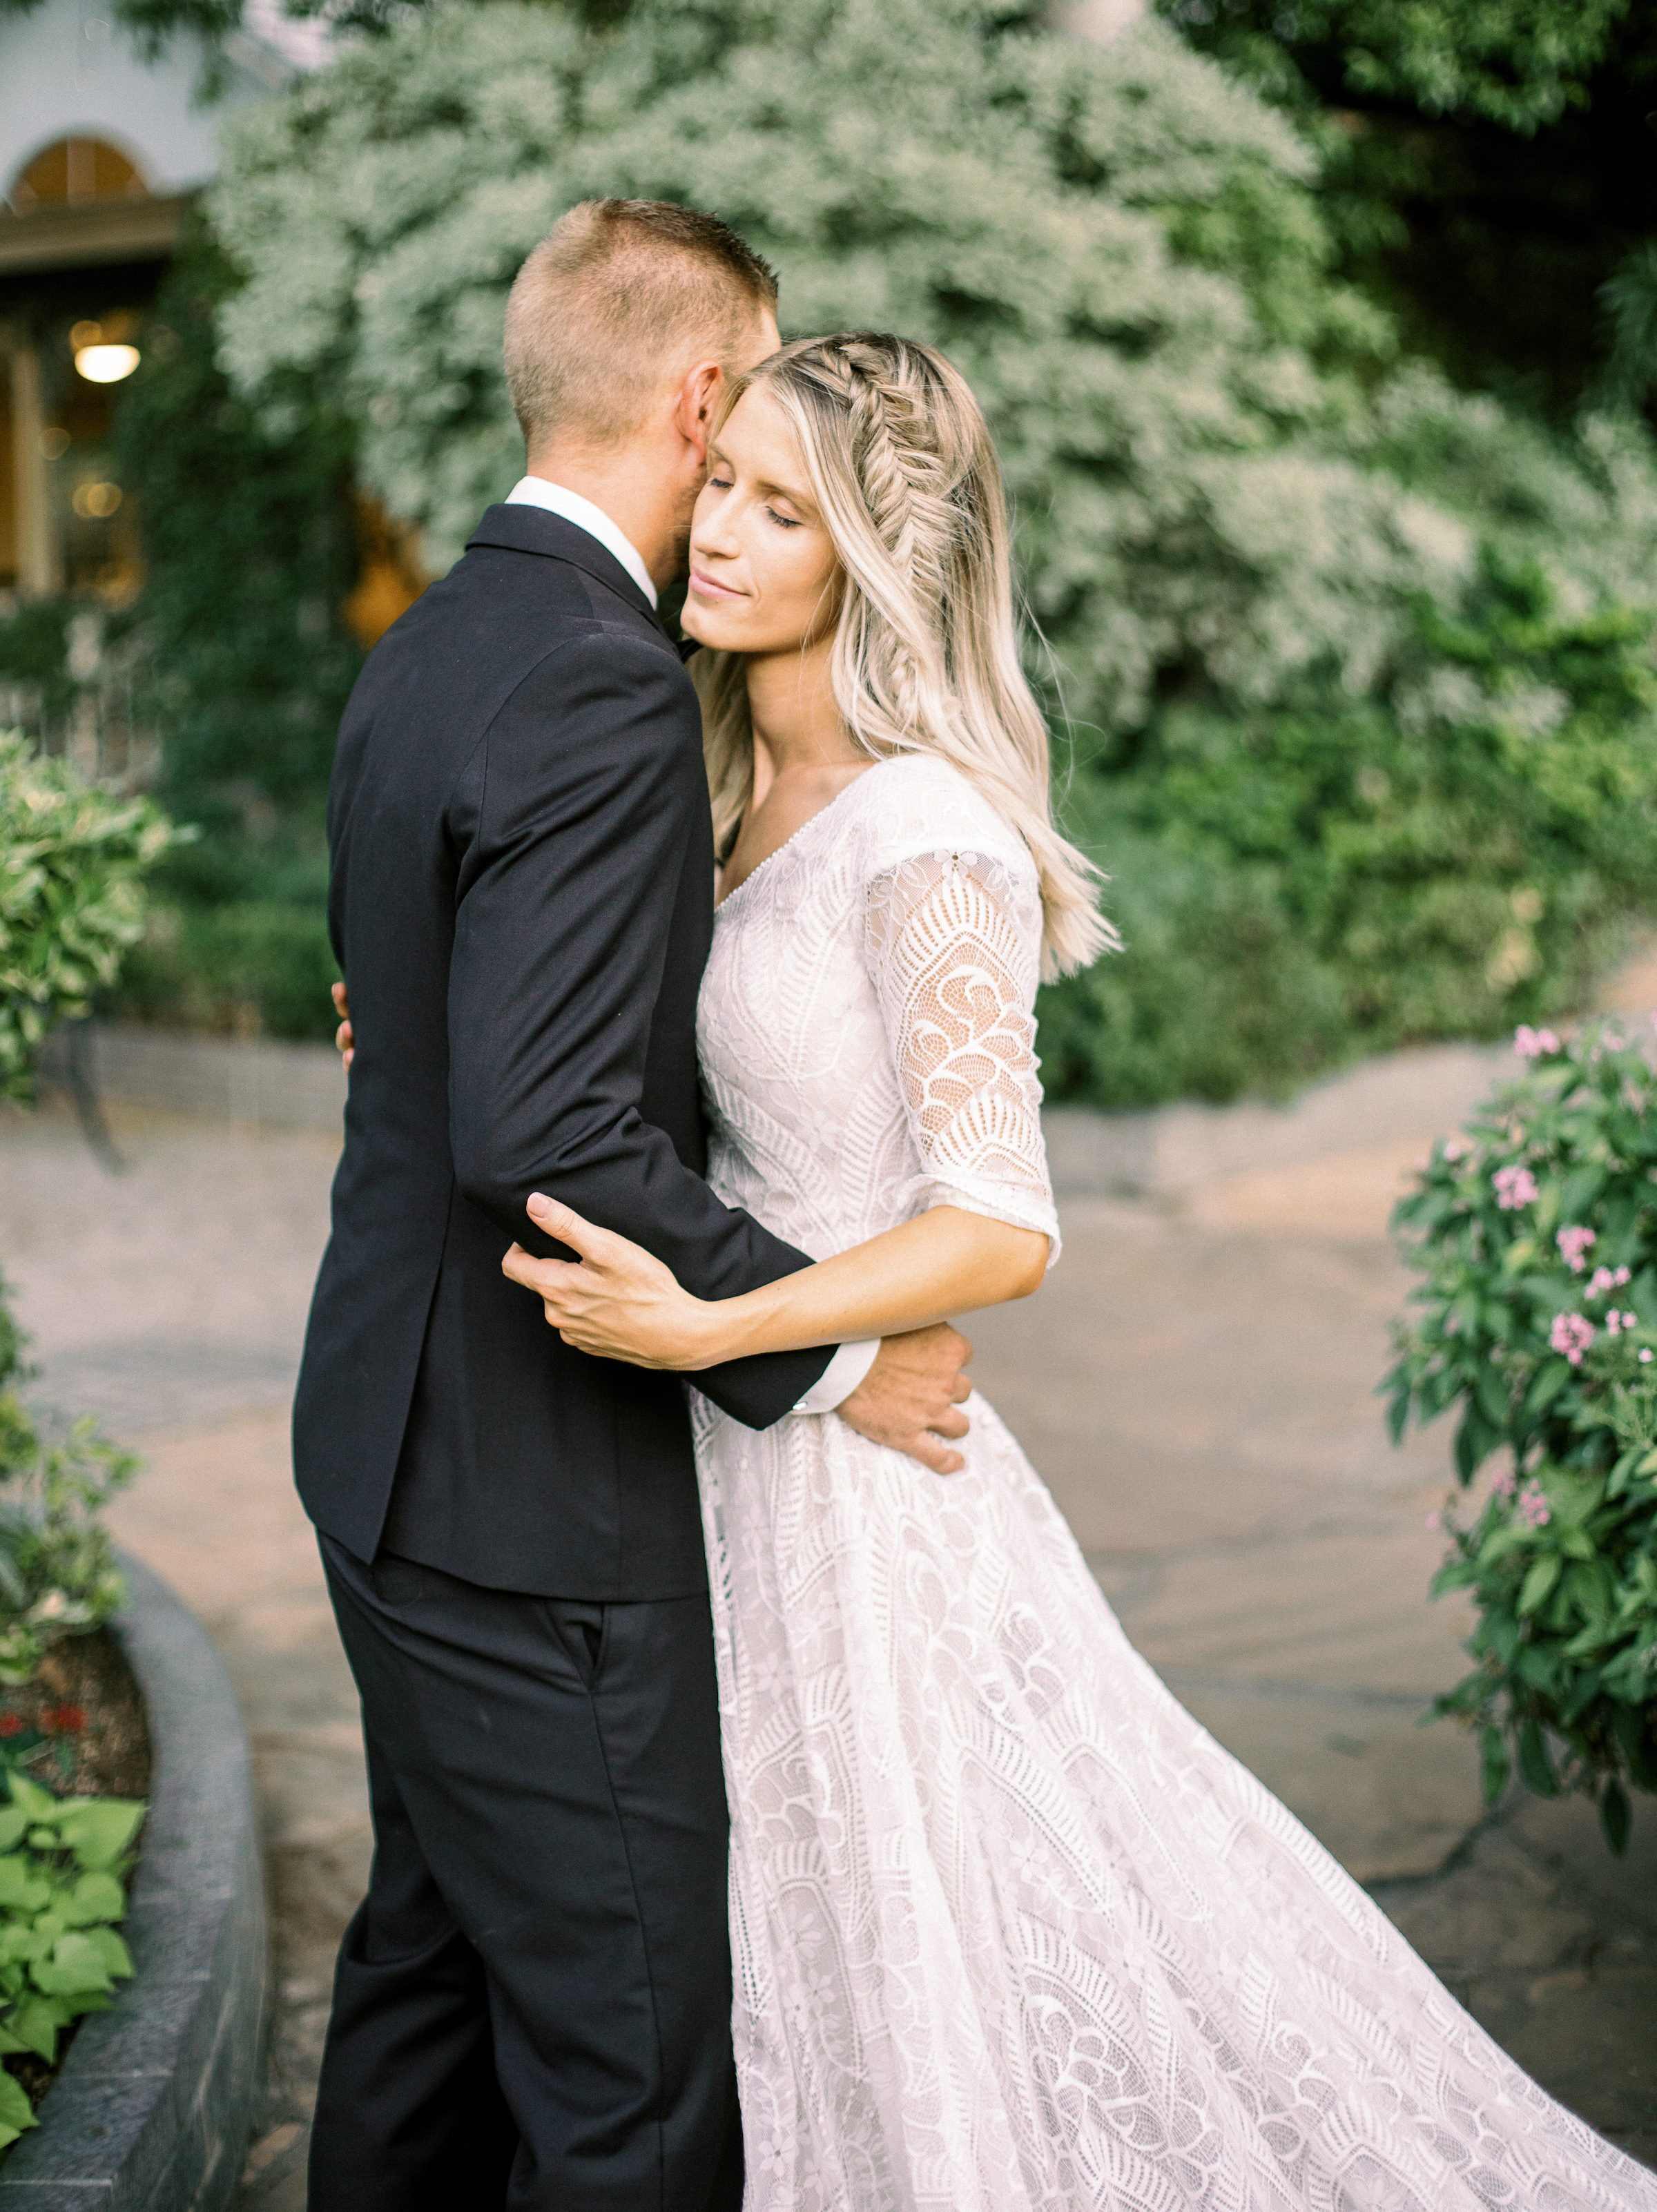 Boho Chic Long Sleeve Wedding Dress Wright House Truth And Beauty Photography 1